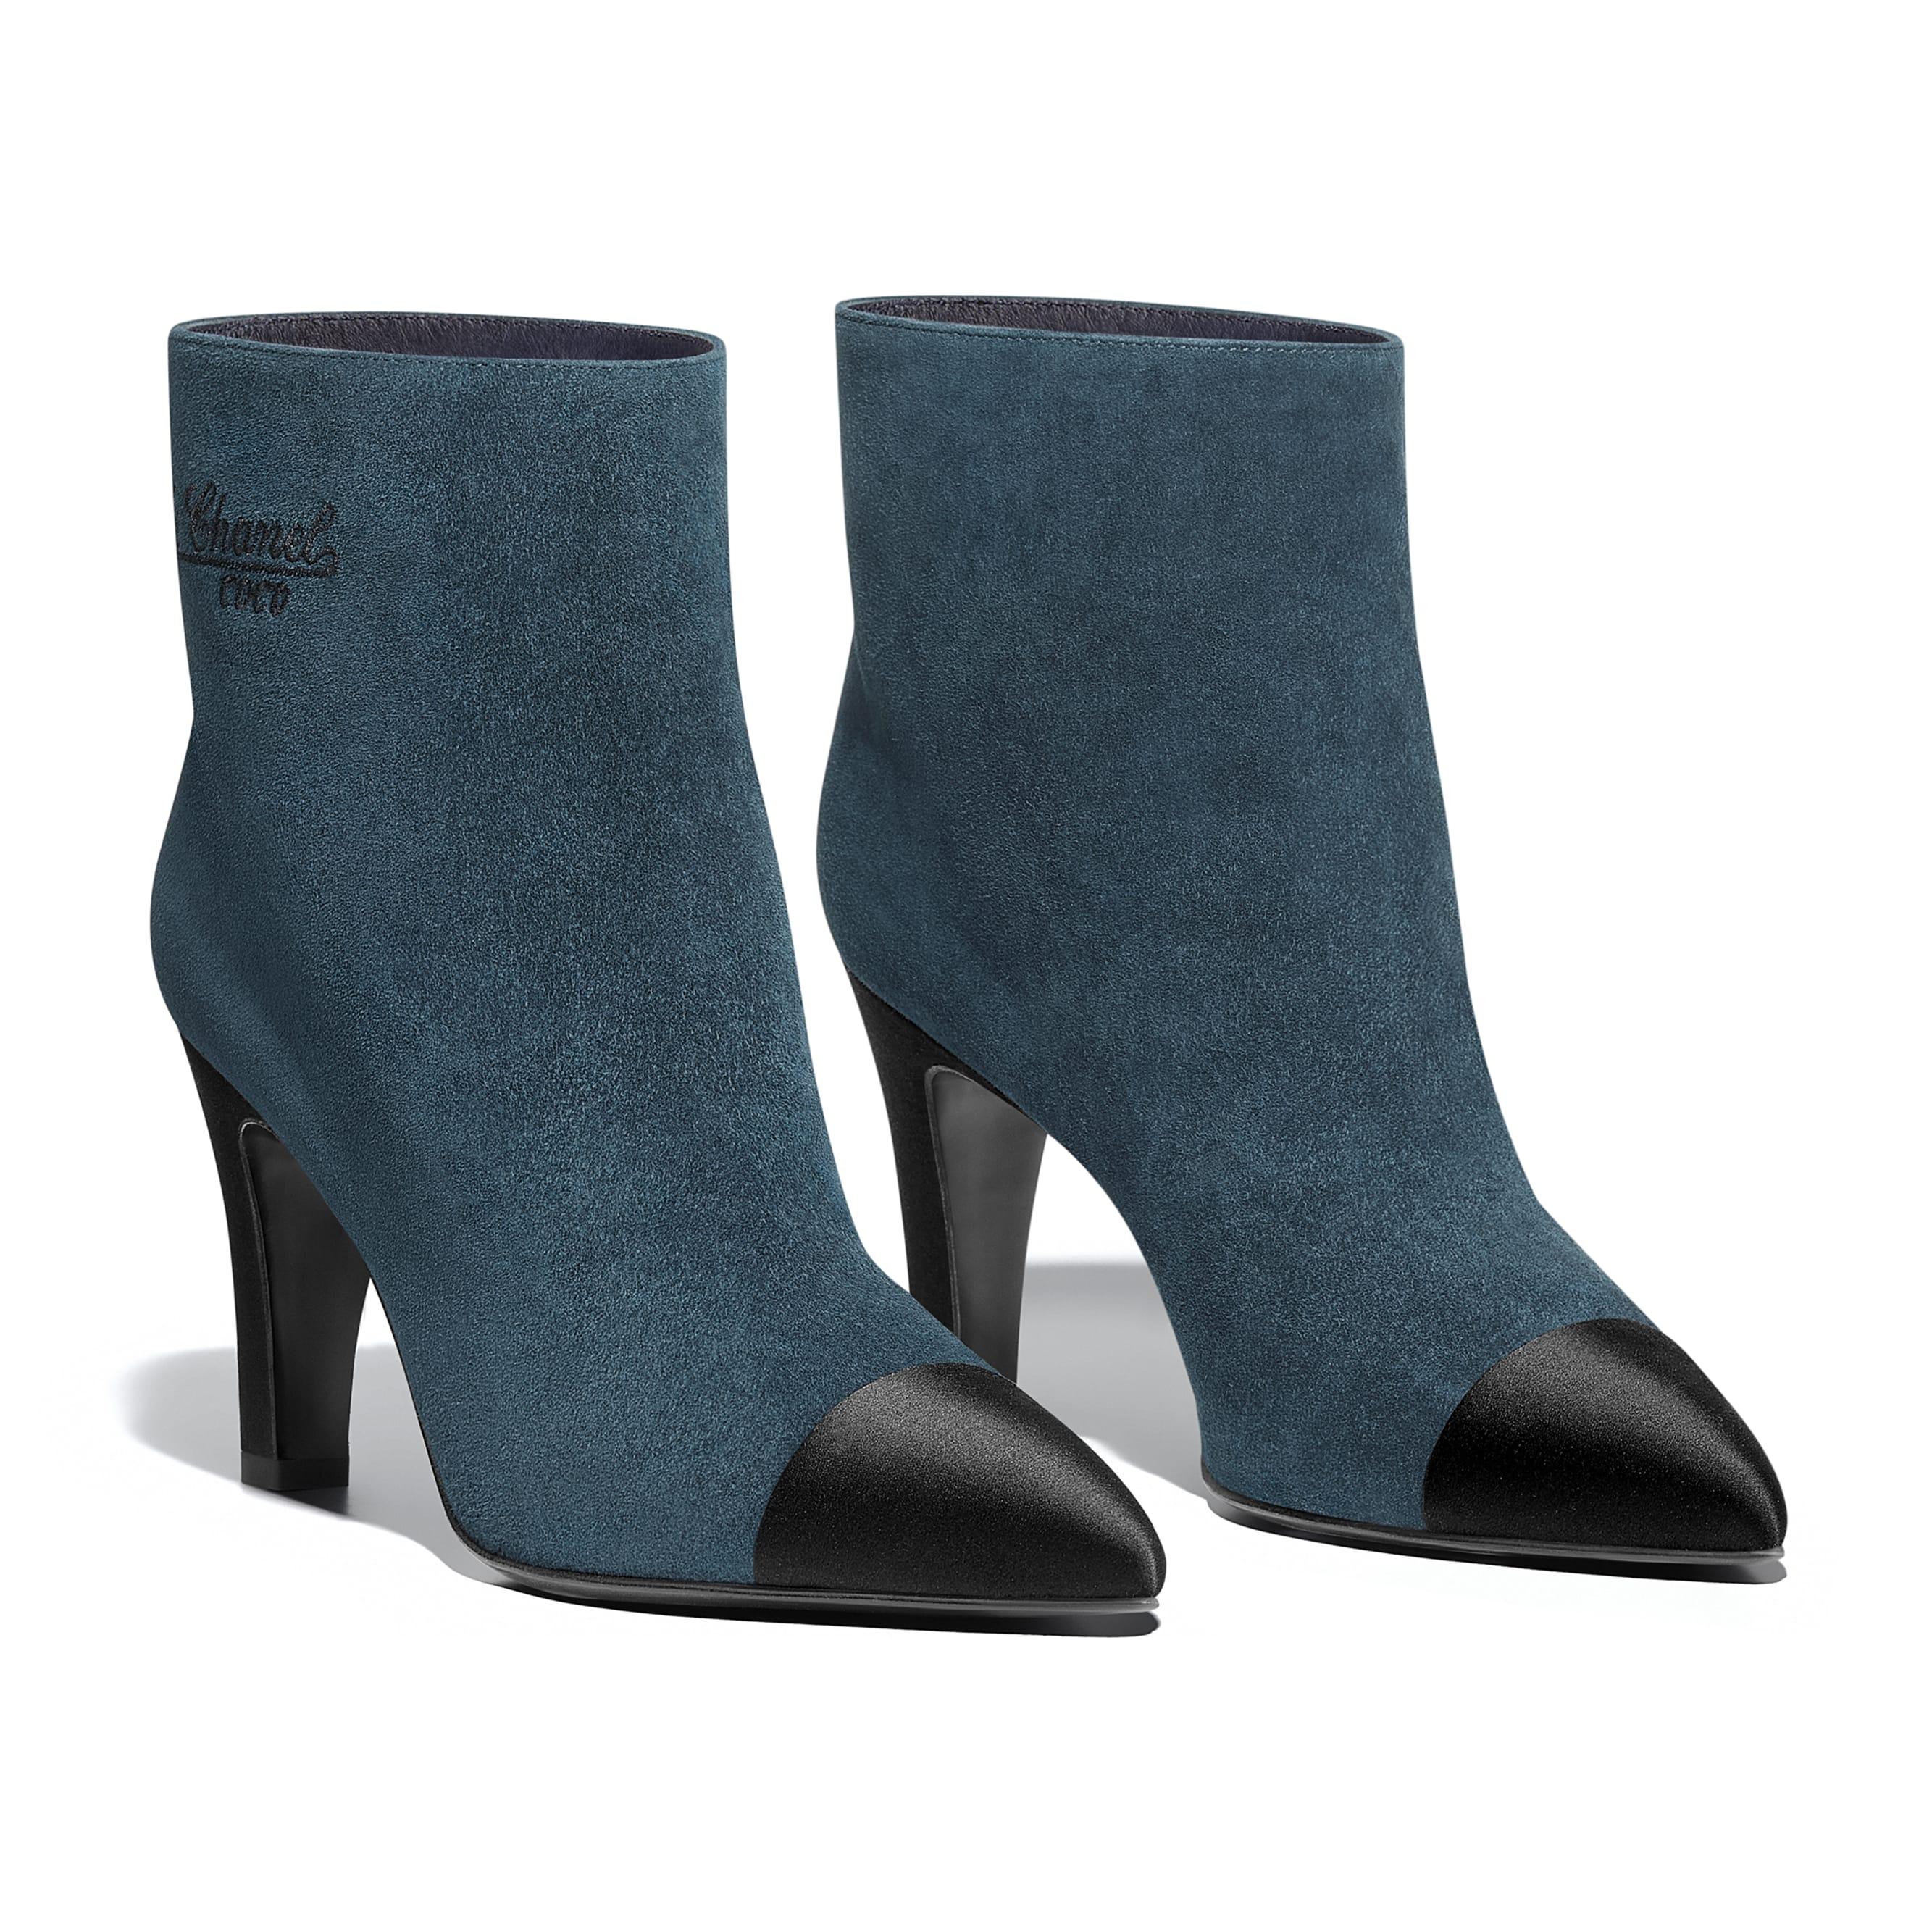 Short Boots - Blue & Black - Suede Calfskin & Satin - Alternative view - see standard sized version